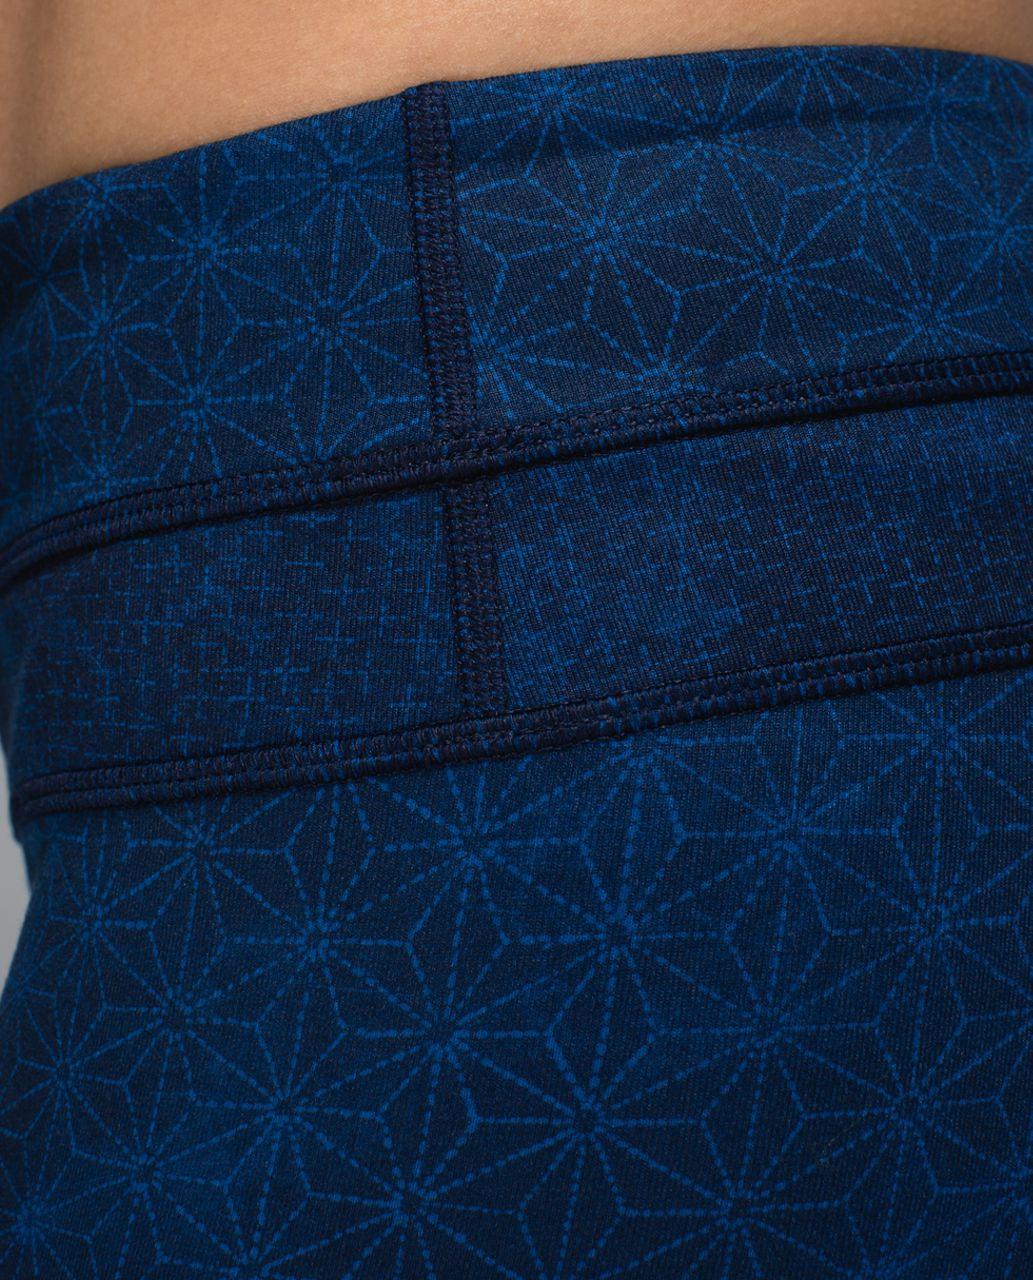 Lululemon Groove Short *Full-On Luon (Regular) - Sashico Star Inkwell Rugged Blue / Sashico Cross Inkwell Rugged Blue